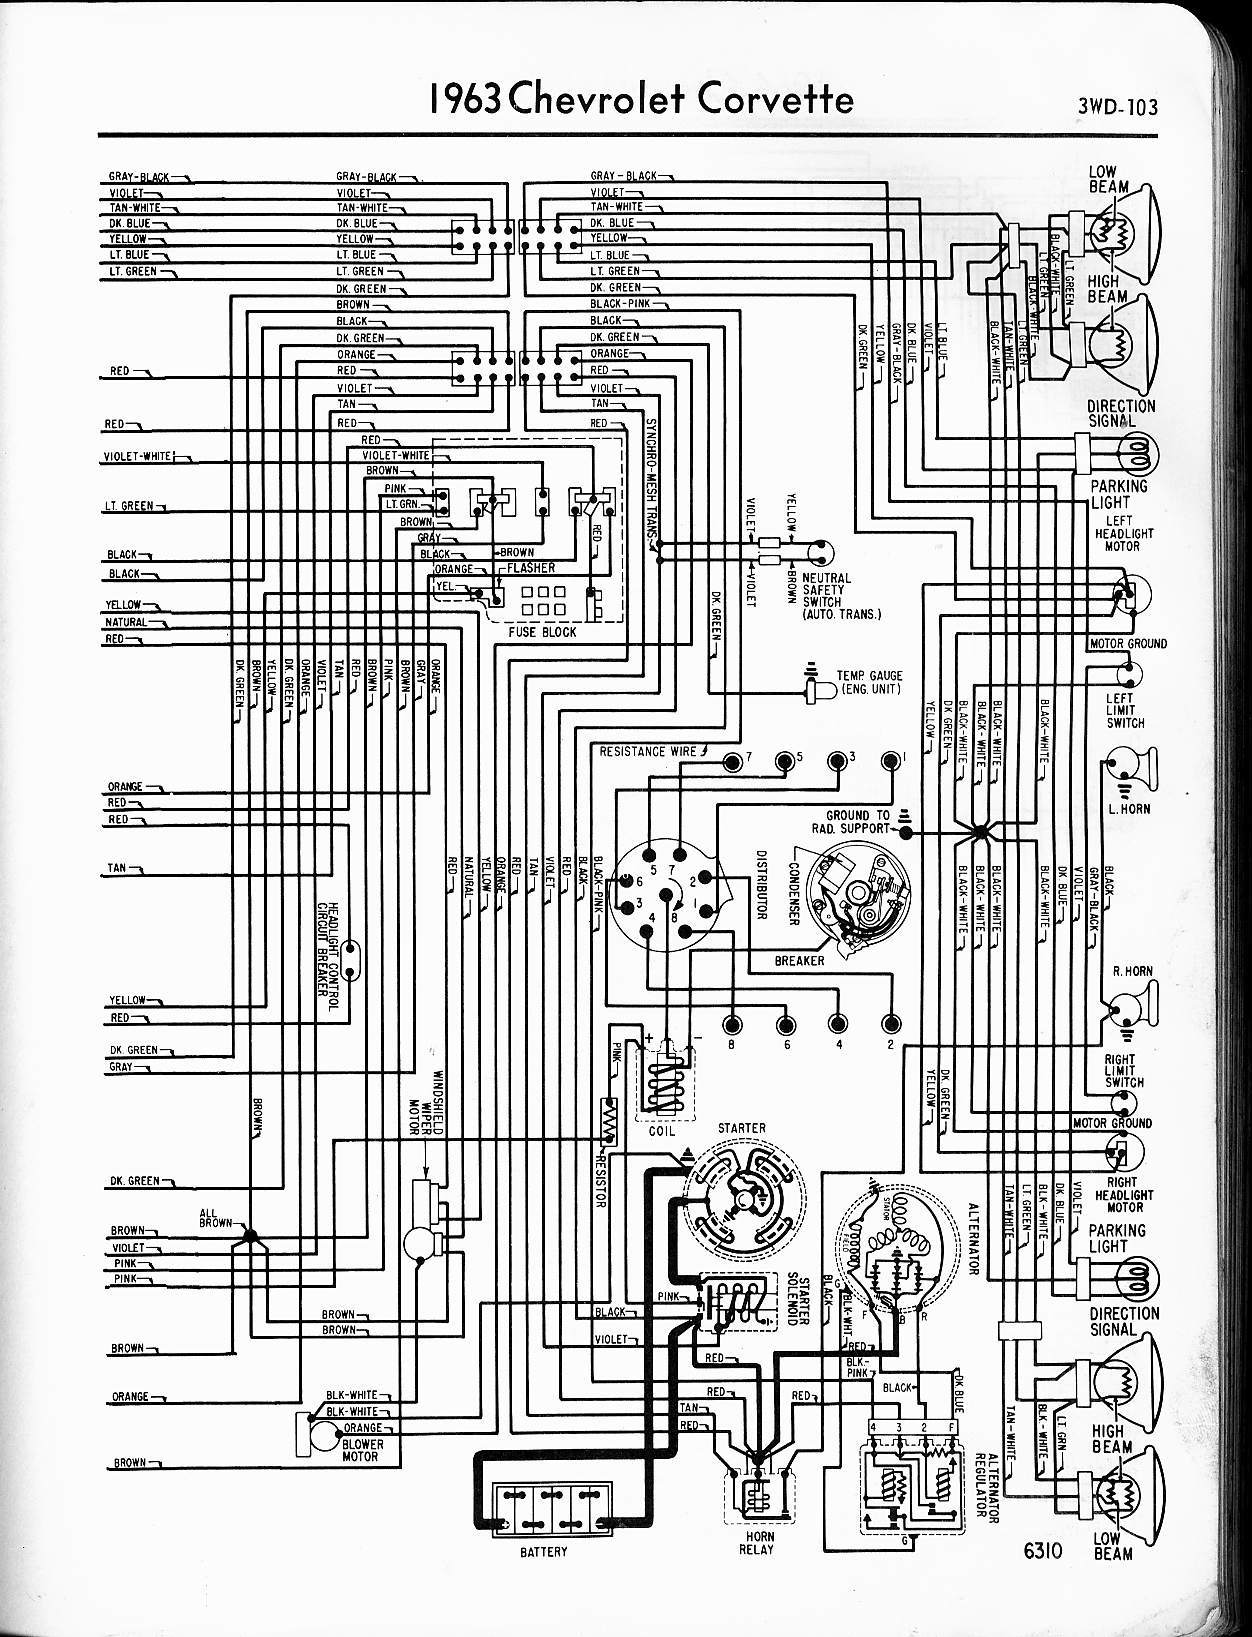 1976 corvette headlight wiring diagram xlr connector 1963 having problem i did something wrong